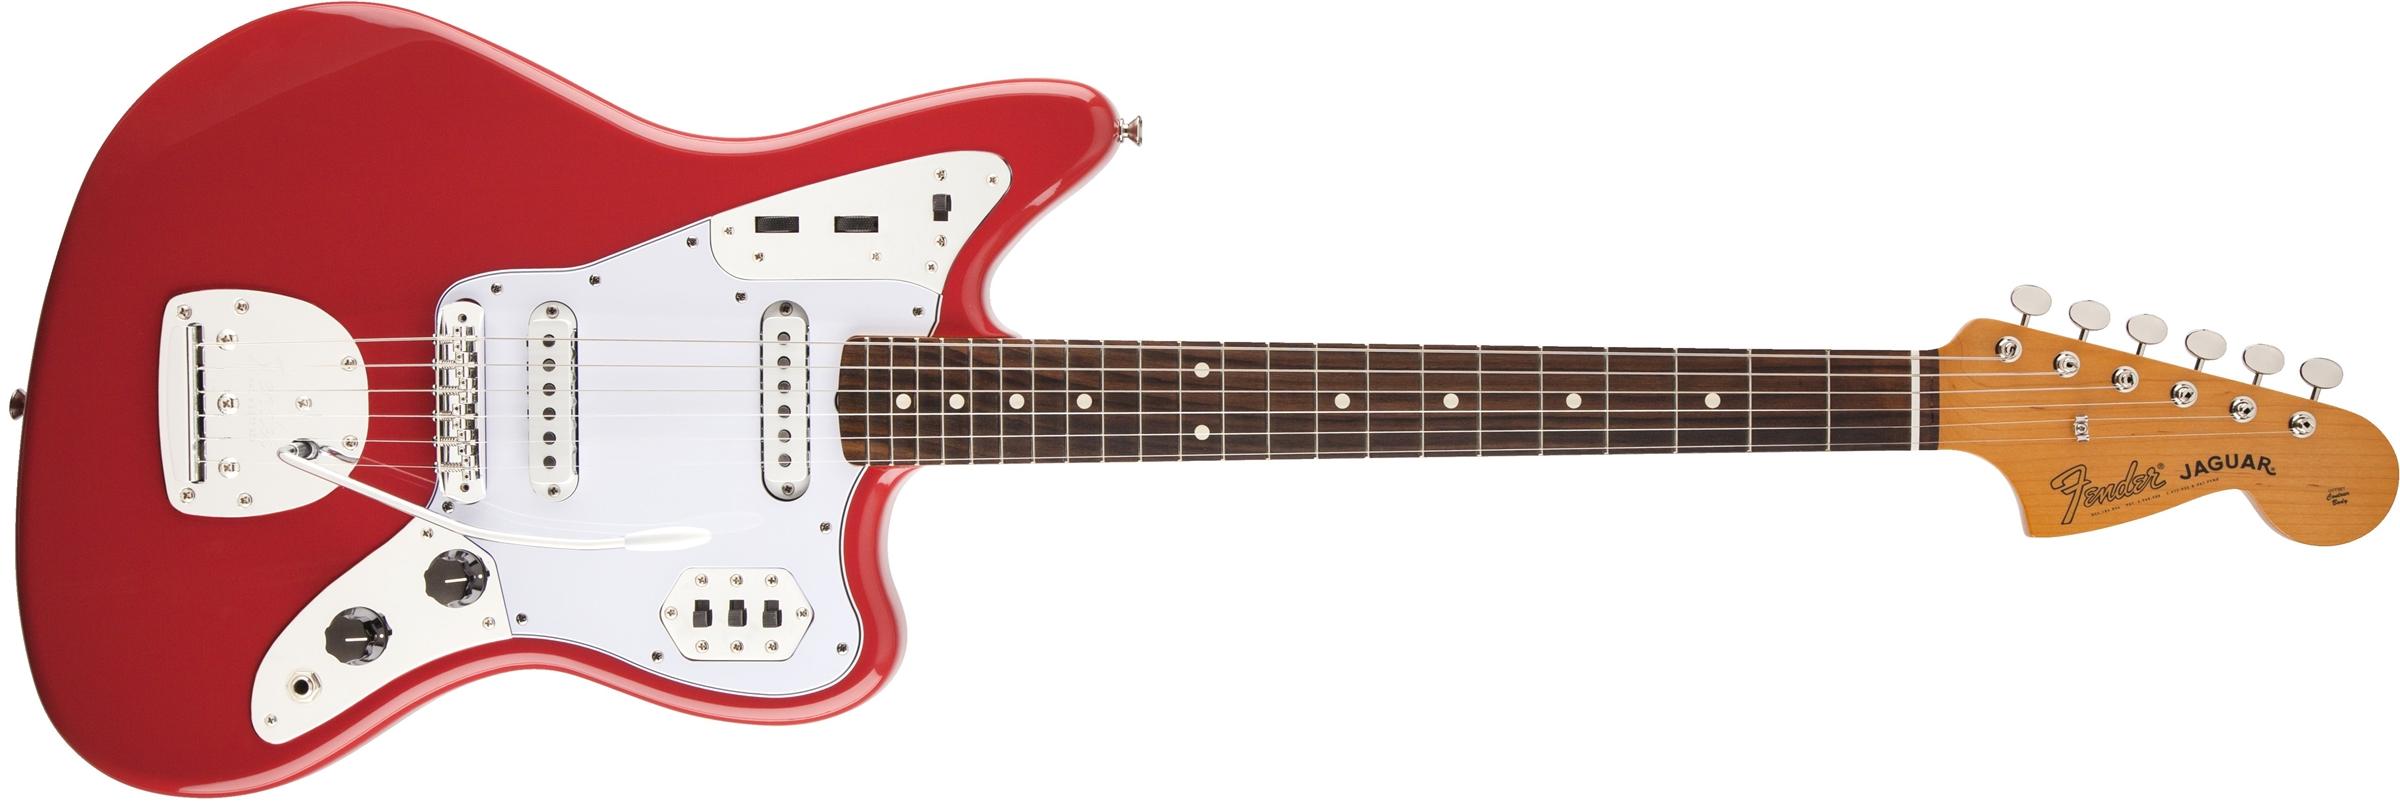 39 60s jaguar lacquer electric guitars. Black Bedroom Furniture Sets. Home Design Ideas